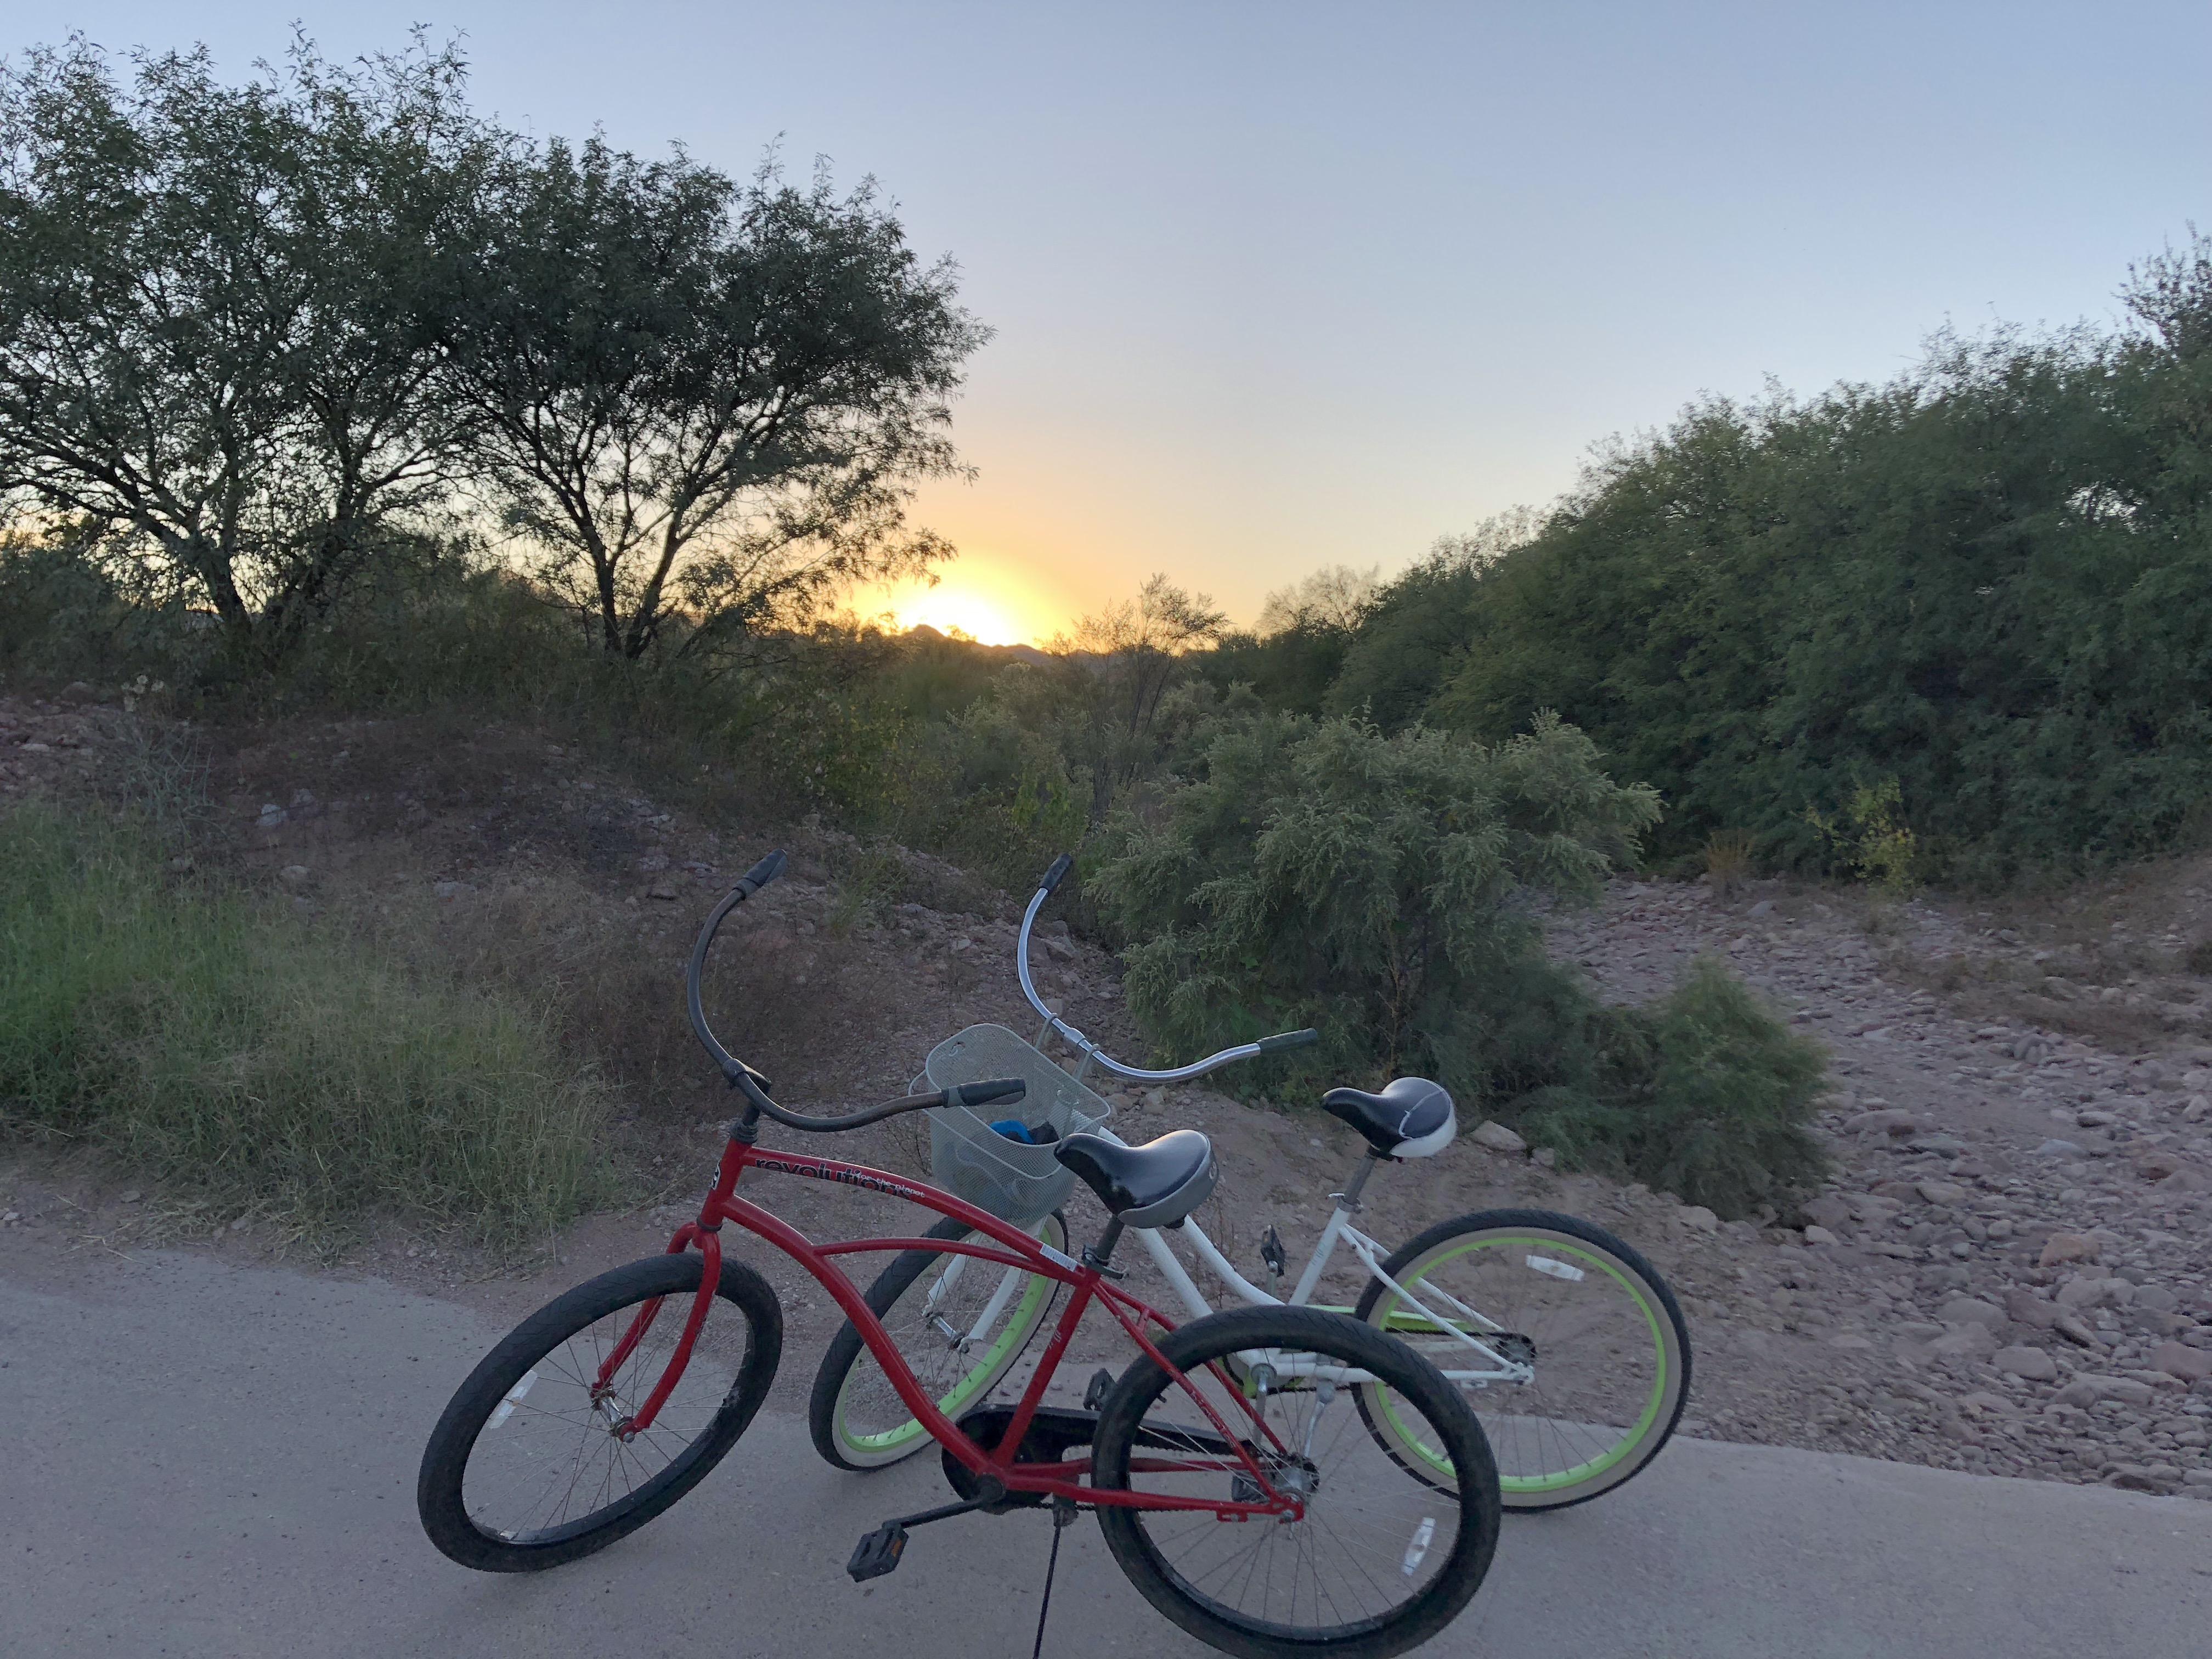 Bikes for borrowing